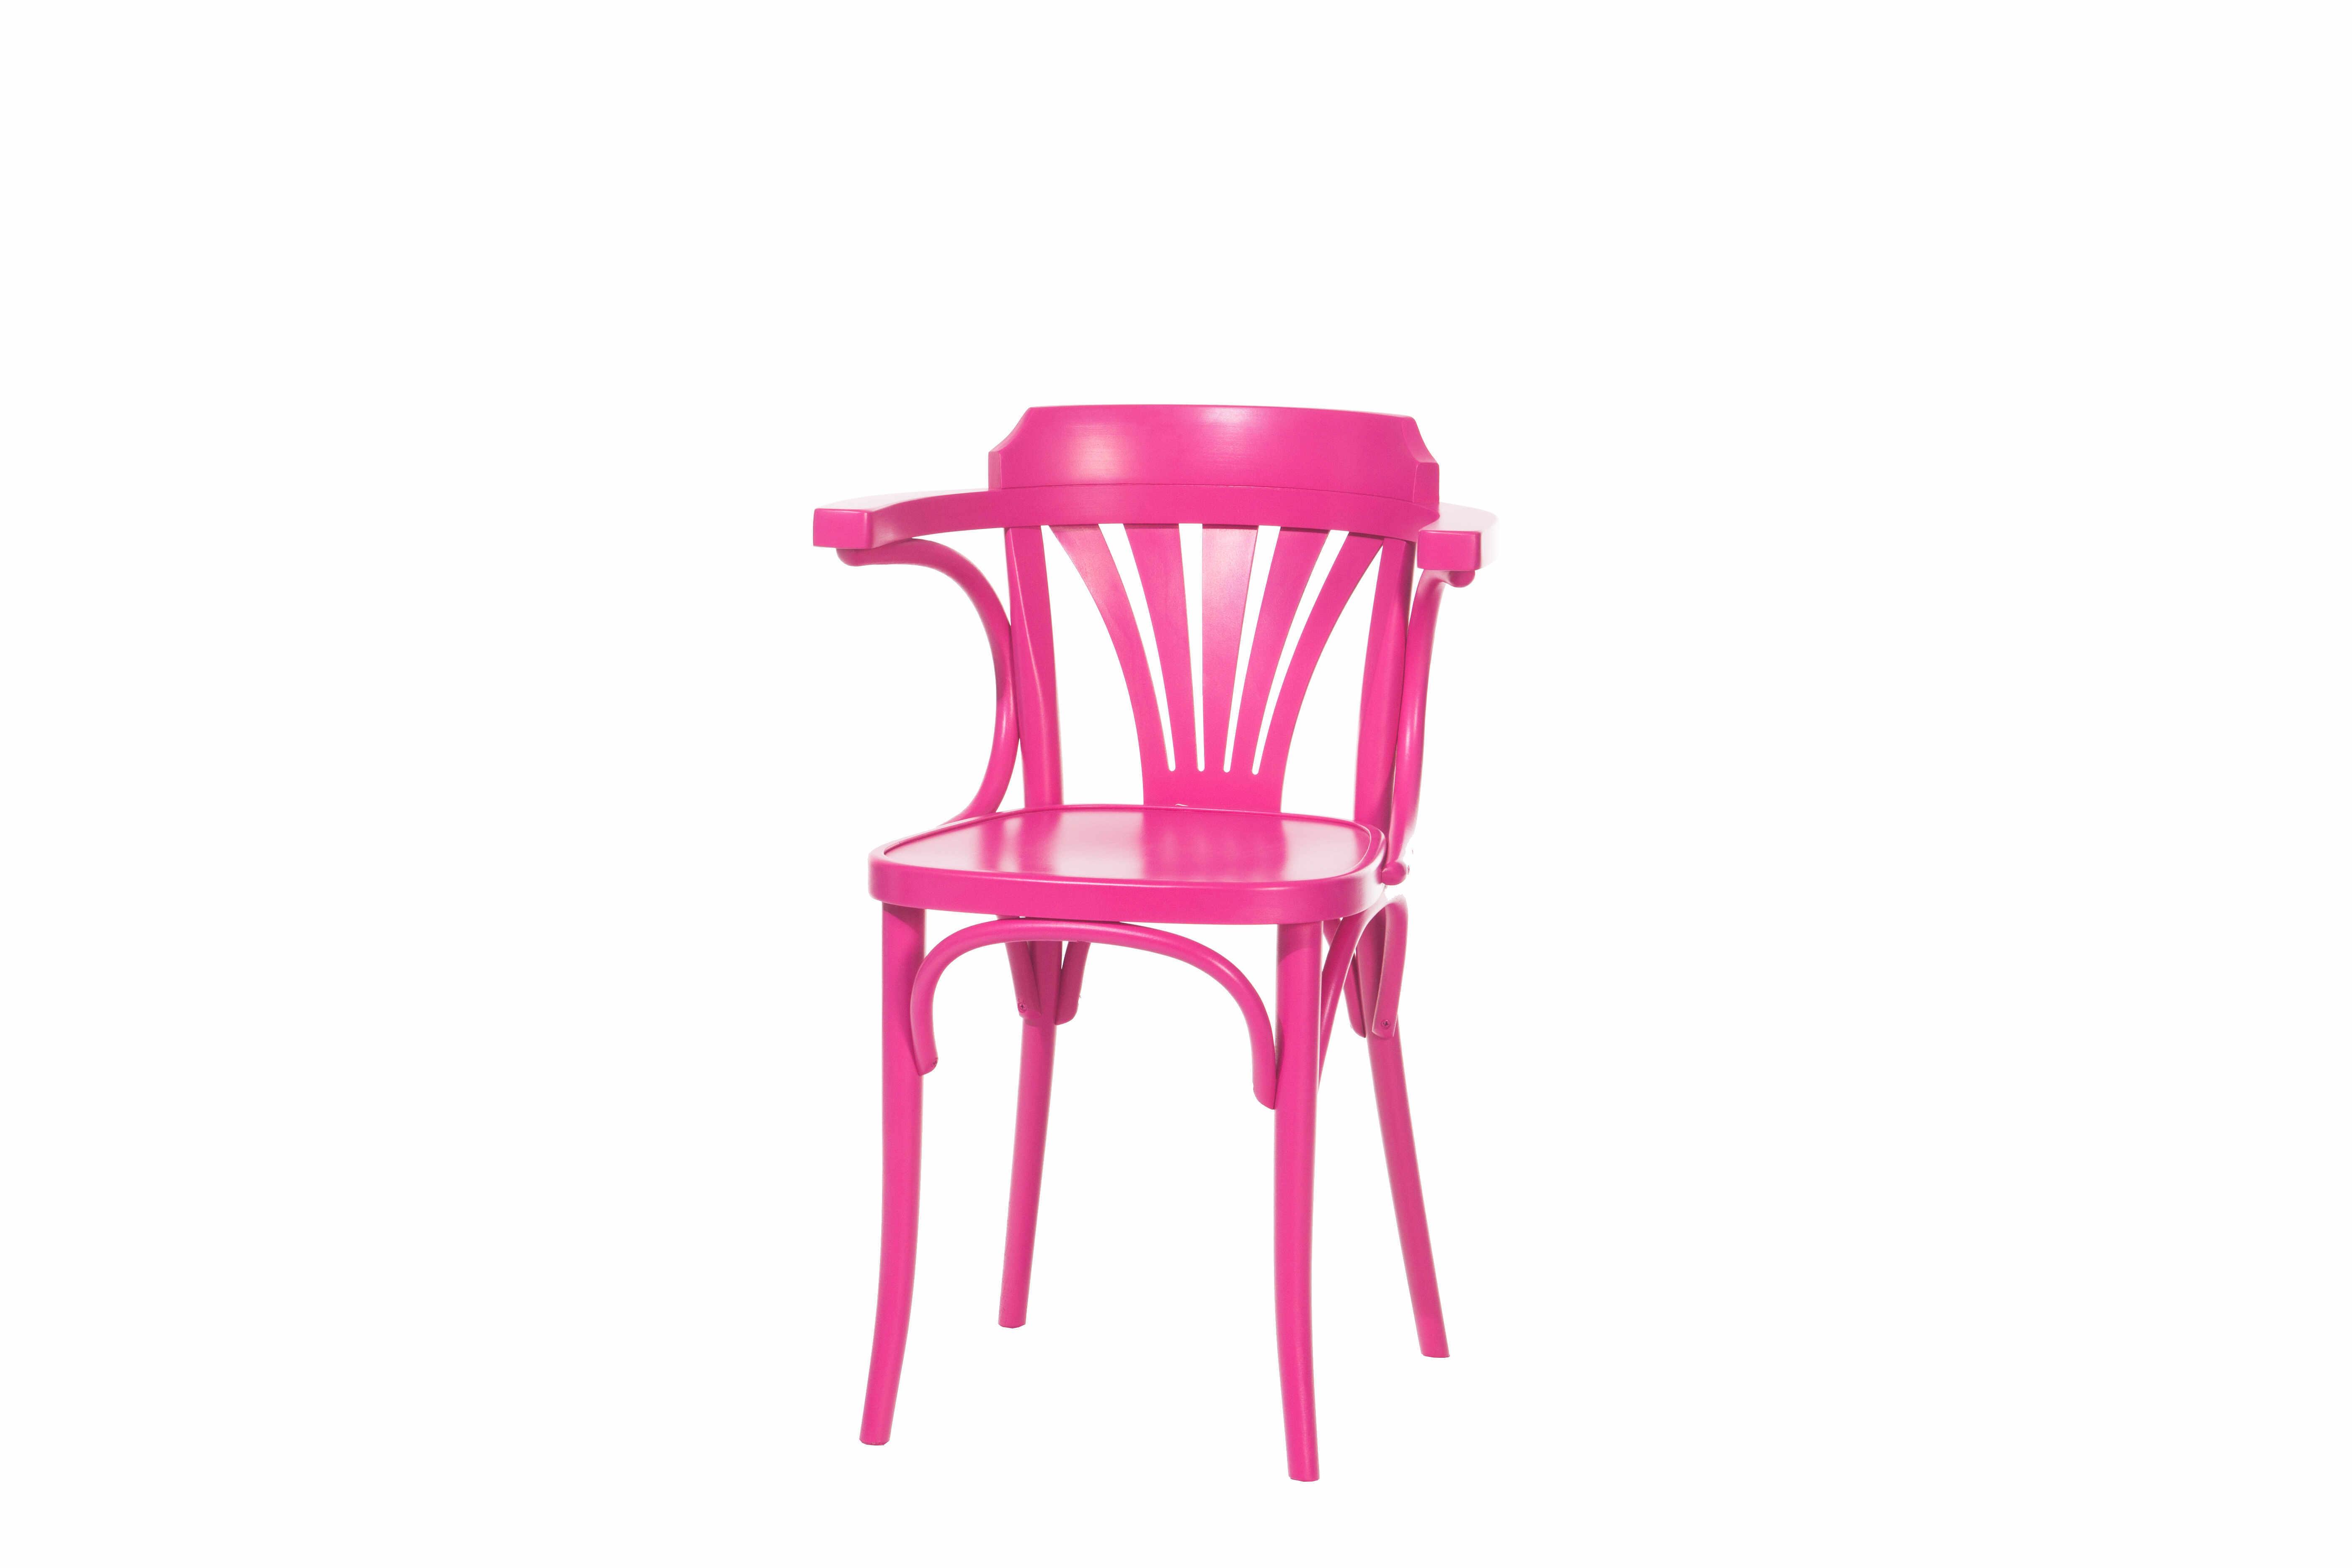 Scaun din lemn de fag 24 Pink, l54xA48xH77 cm la pret 1378 lei